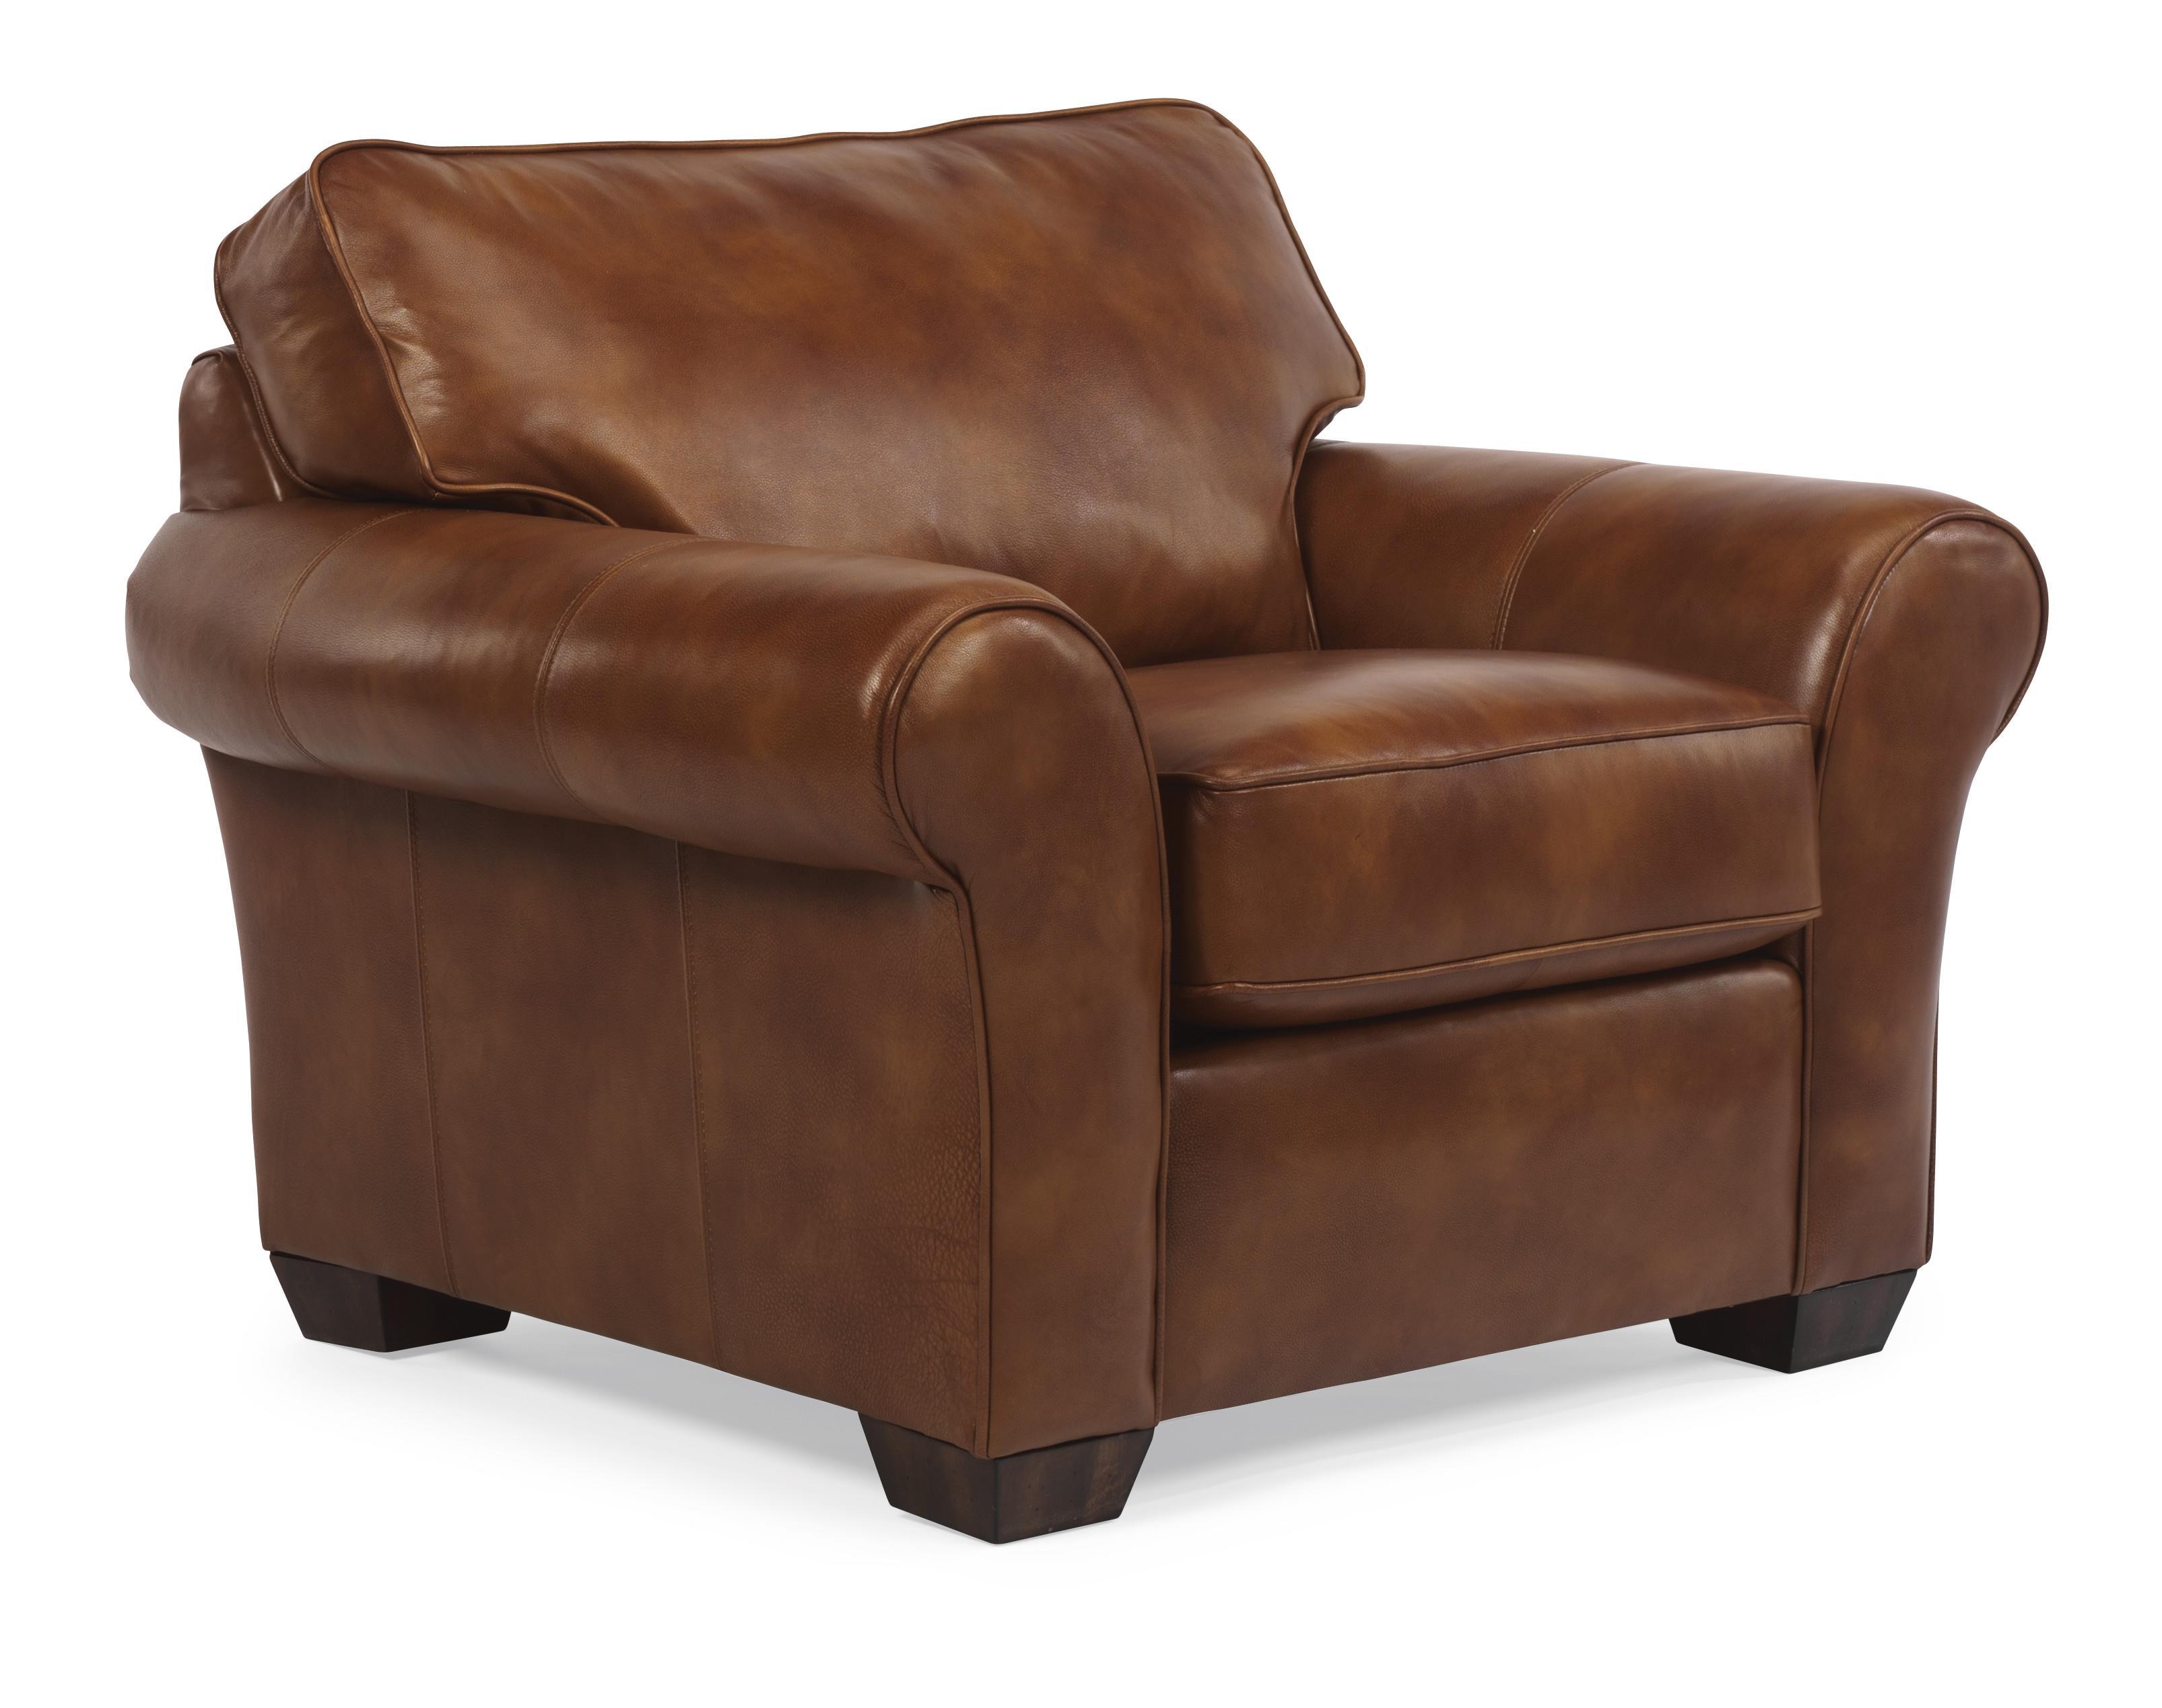 Flexsteel Vail 3305 10 Vail Upholstered Chair Dunk